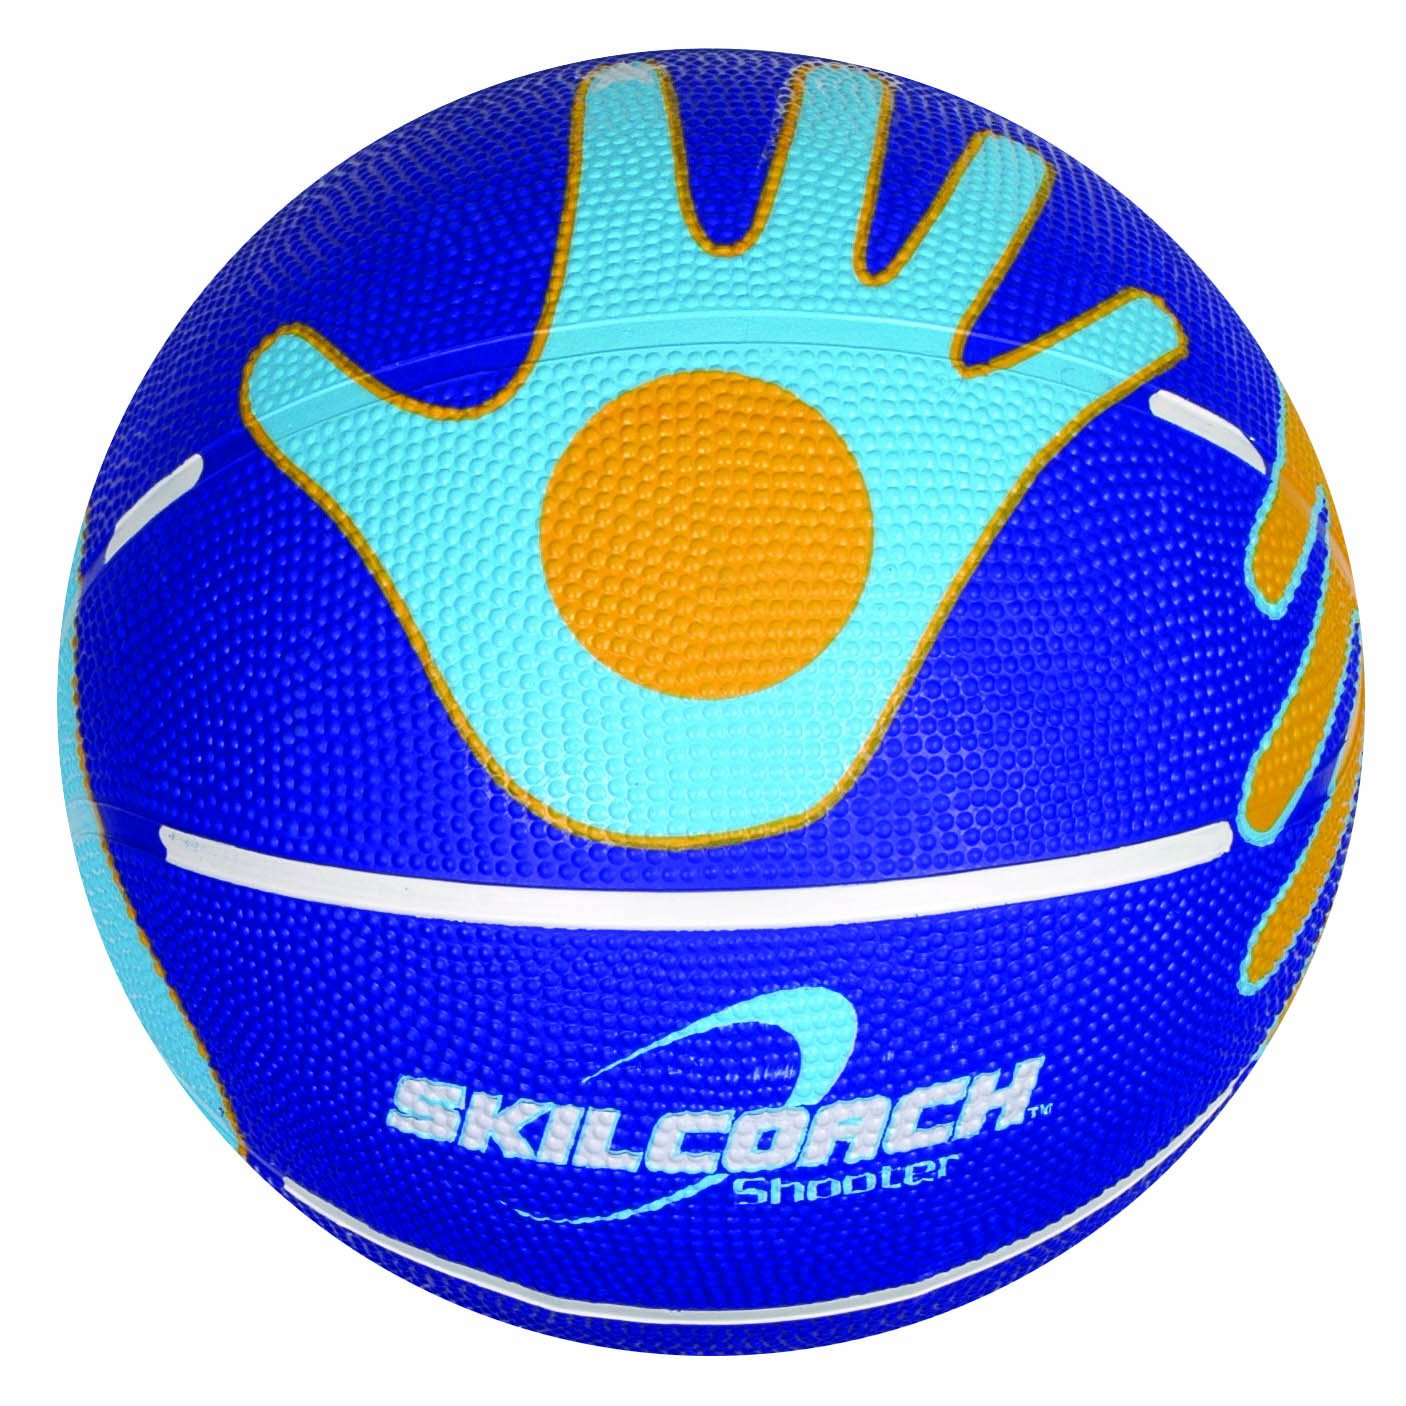 Baden Skilcoach - Pelota de Baloncesto para Aprendizaje (Talla 5 ...